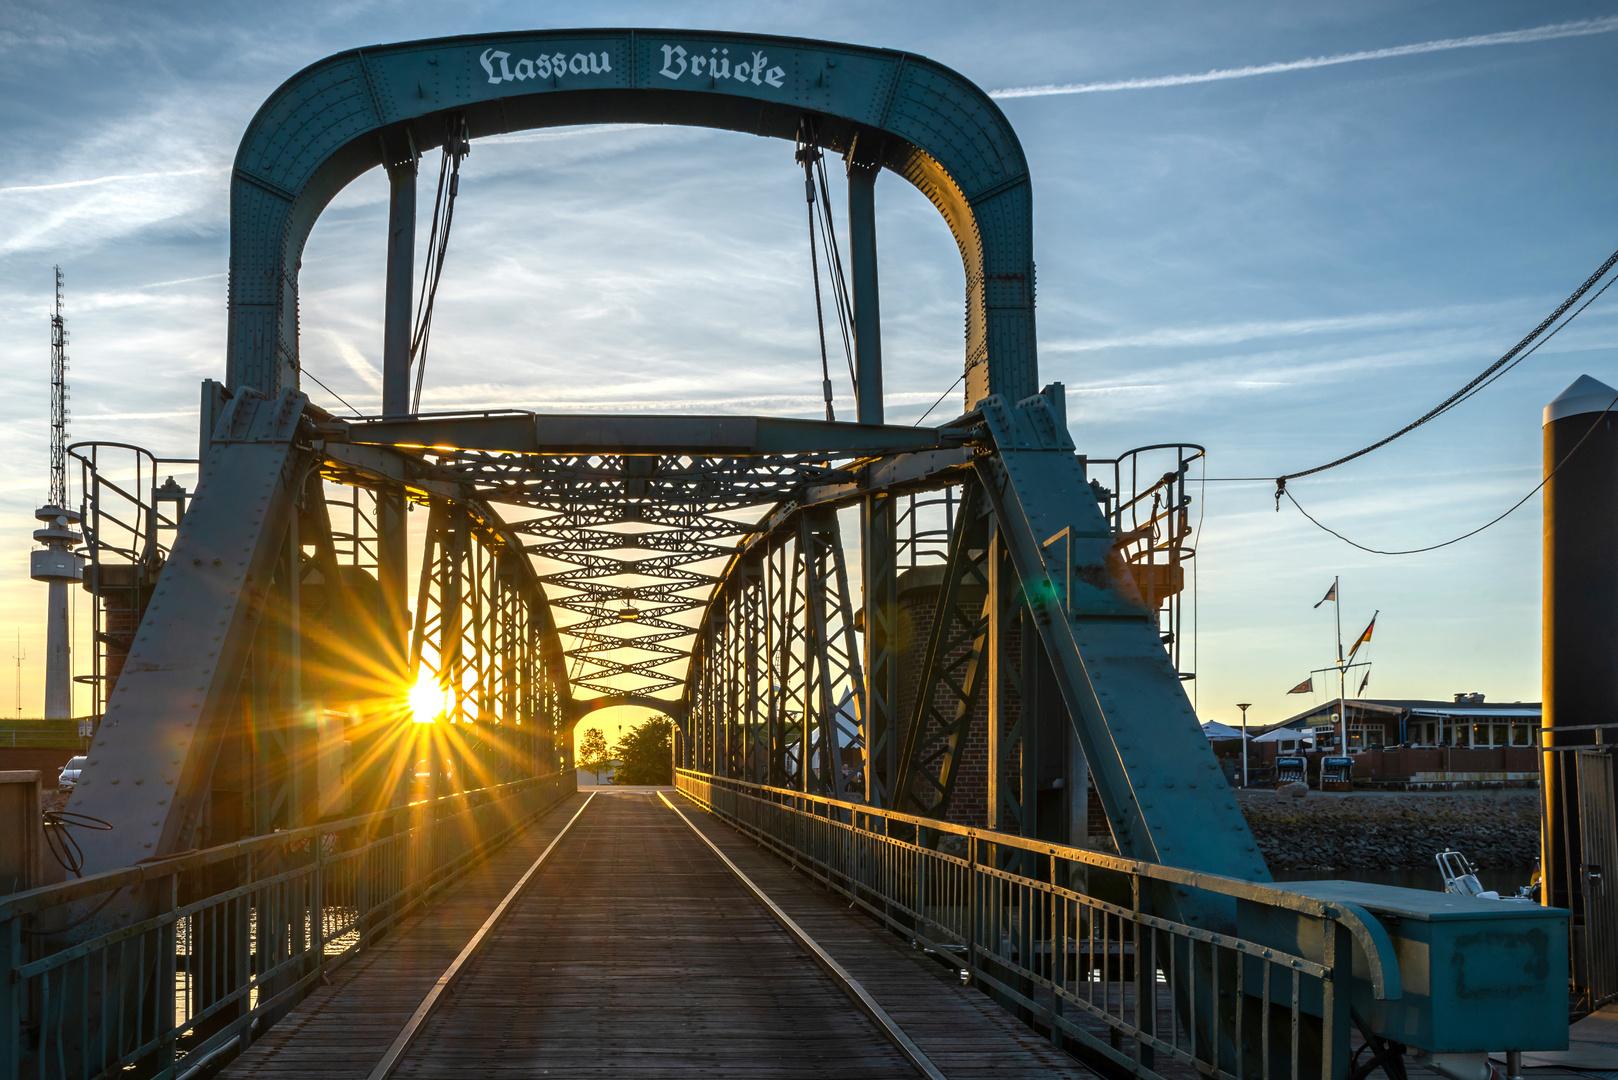 Nassaubrücke